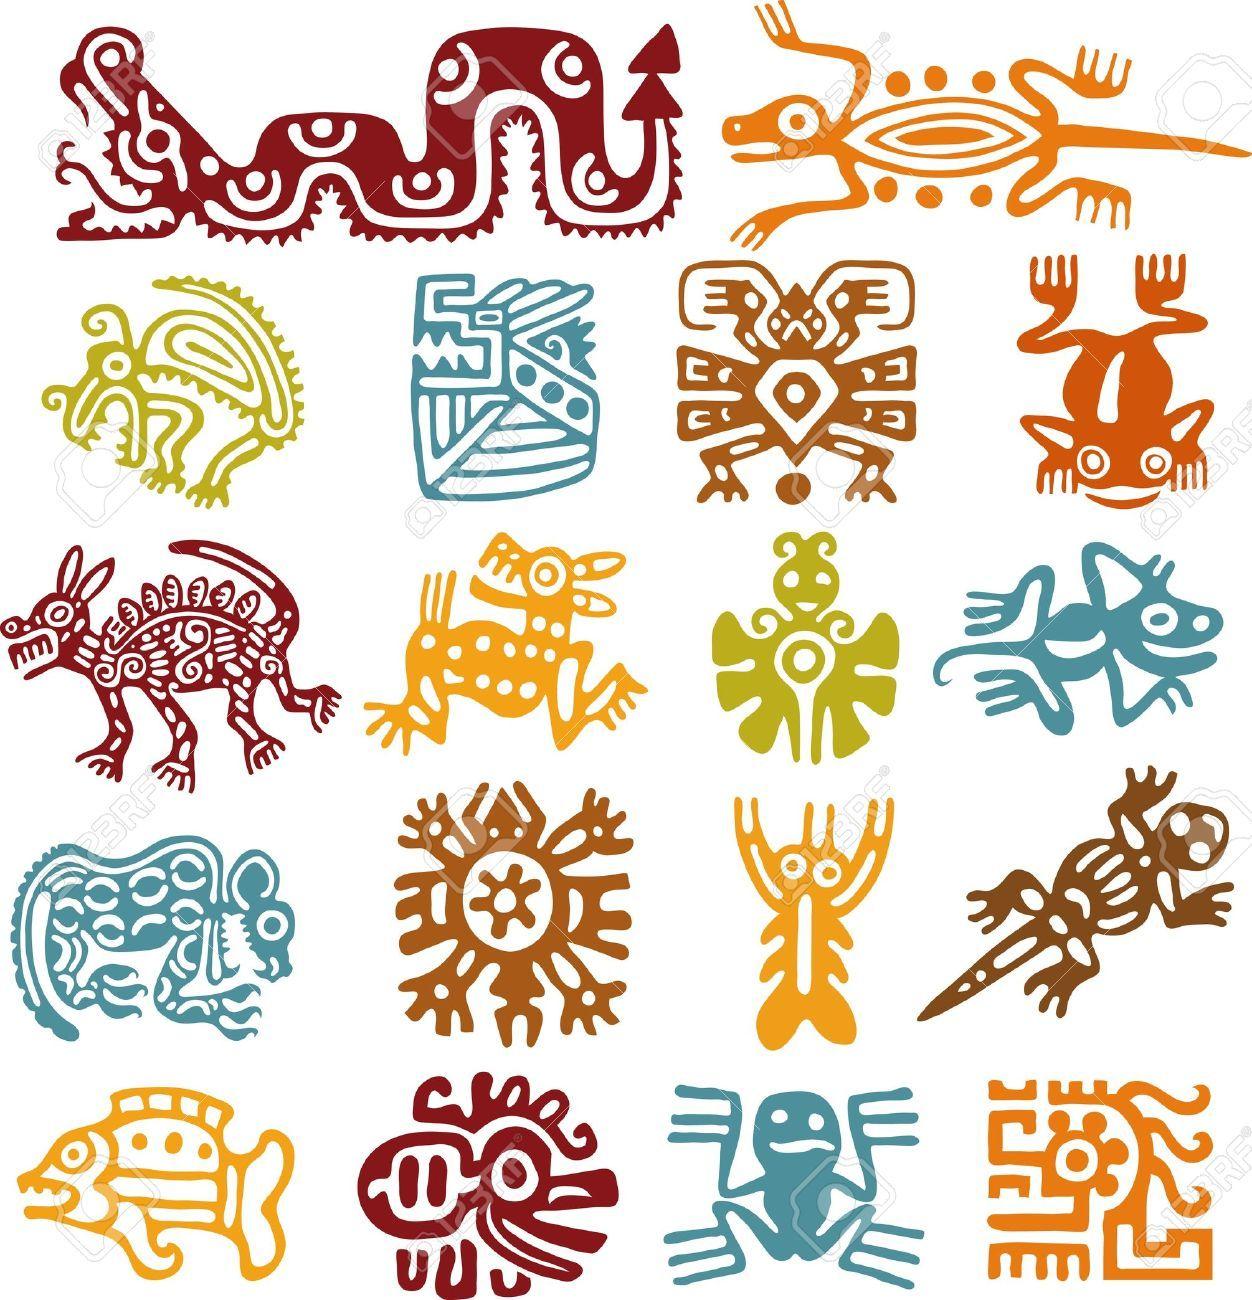 Aztec Symbol Images Stock Pictures Royalty Free Aztec Symbol